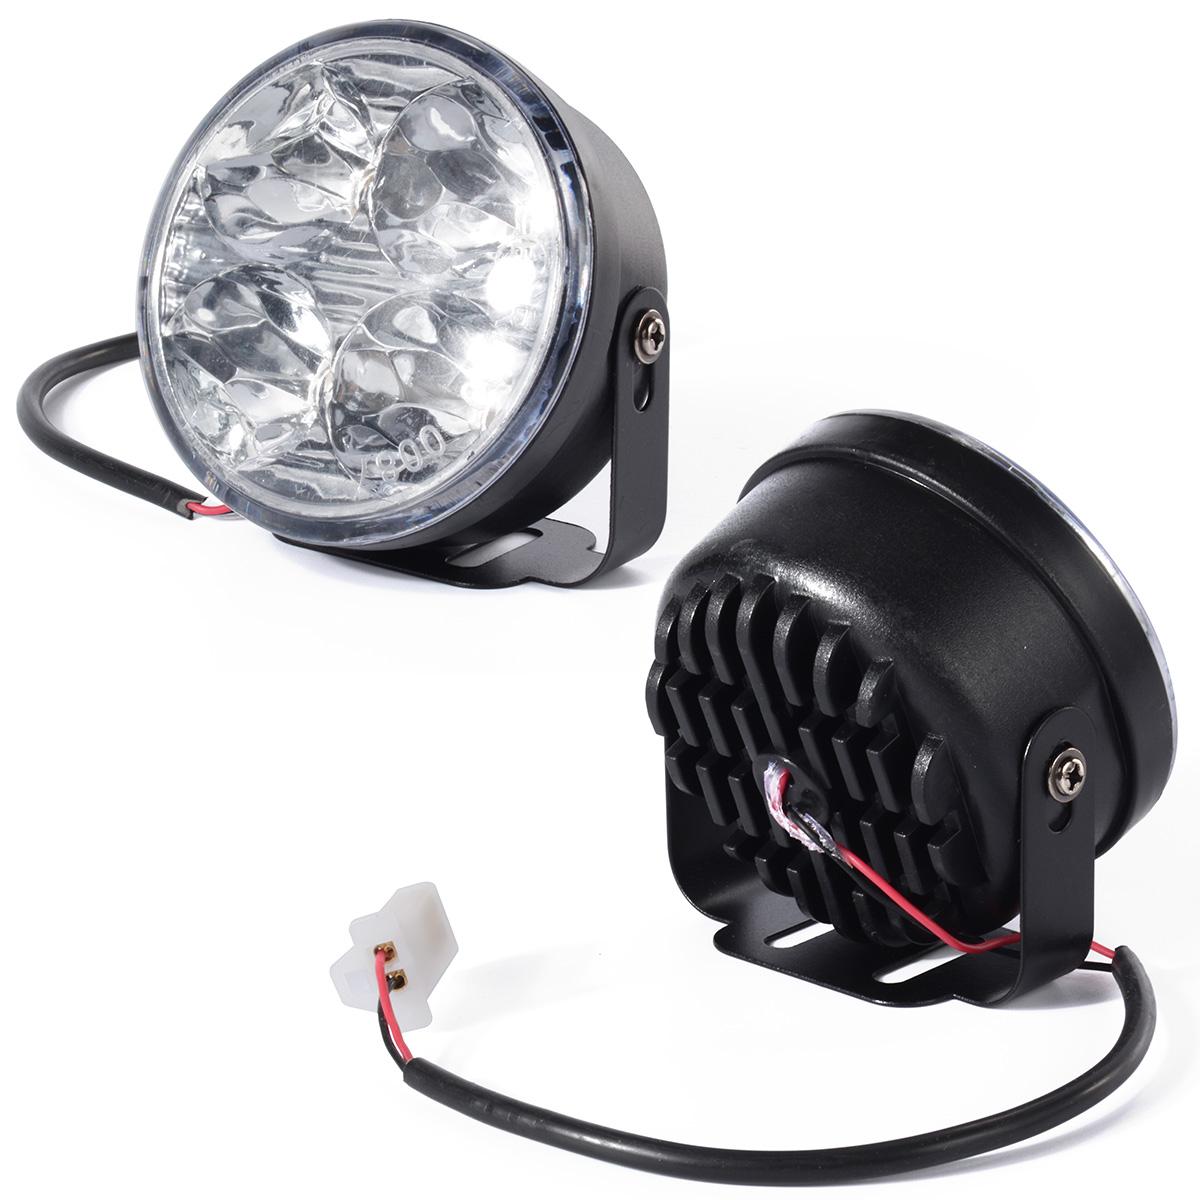 Car styling 2x Daytime Running 4 LED DRL Head Light white Lamp Car 12V Round Kit Fog led car MA135(China (Mainland))